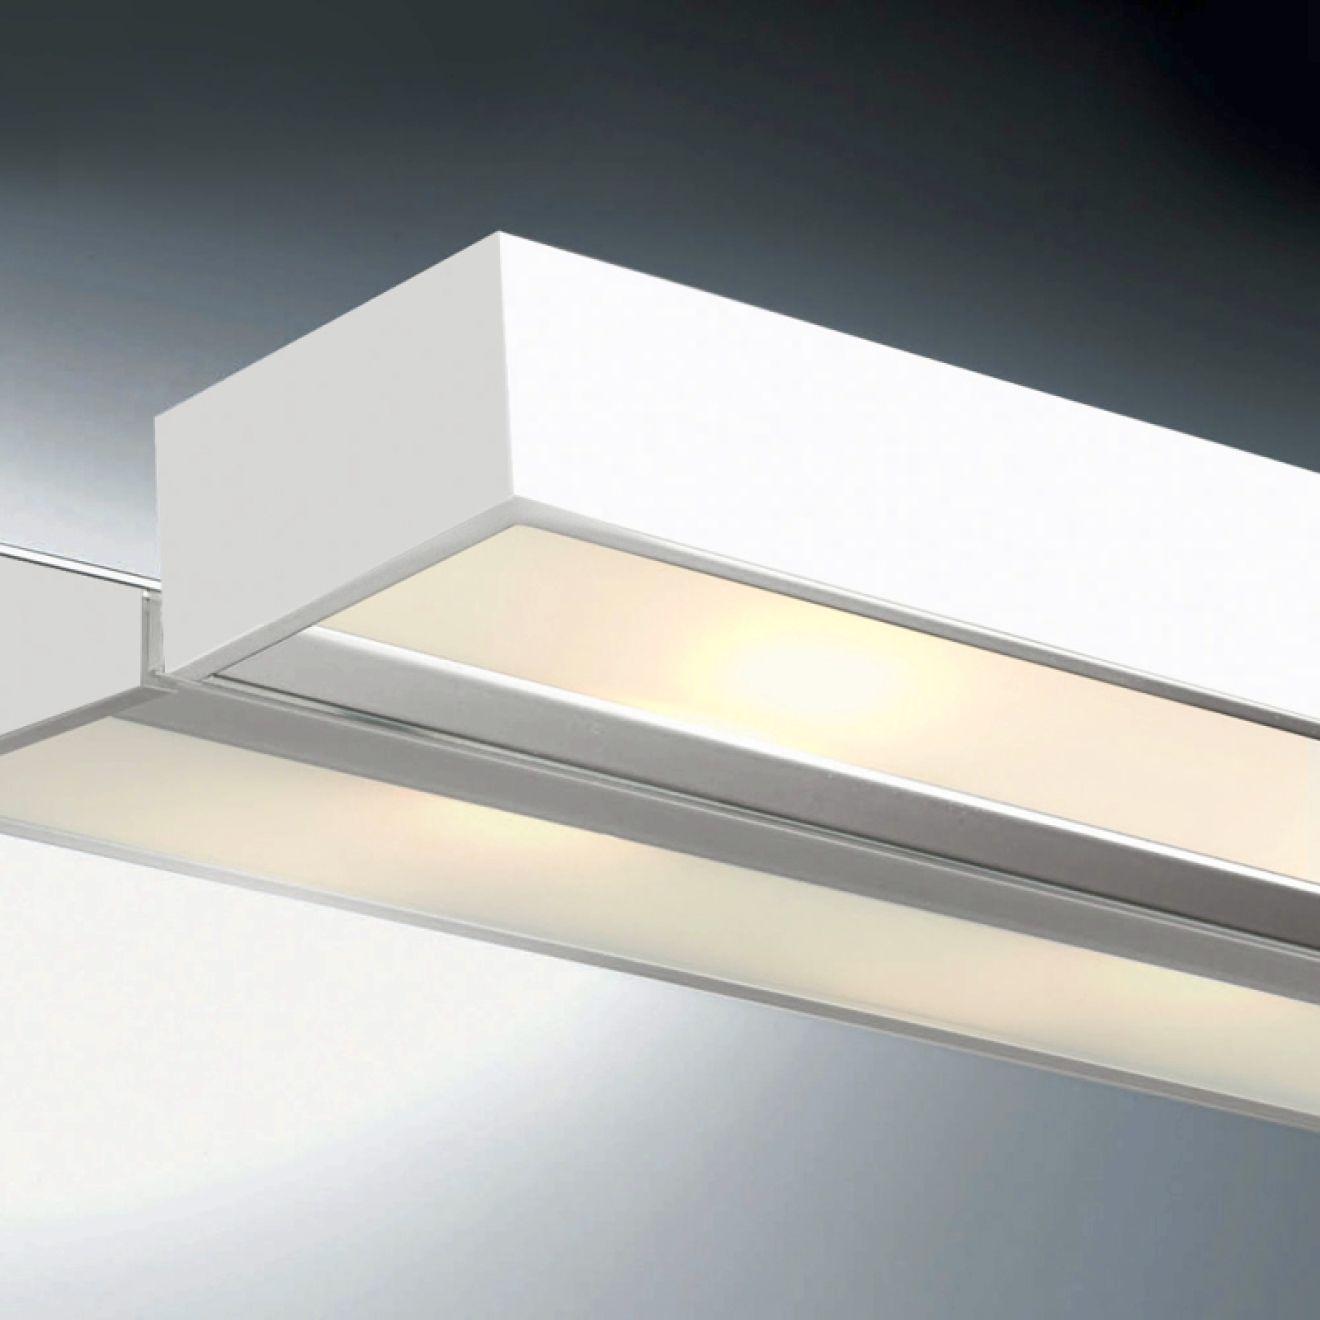 decor walther box 1 60 led spiegelleuchte 417650. Black Bedroom Furniture Sets. Home Design Ideas